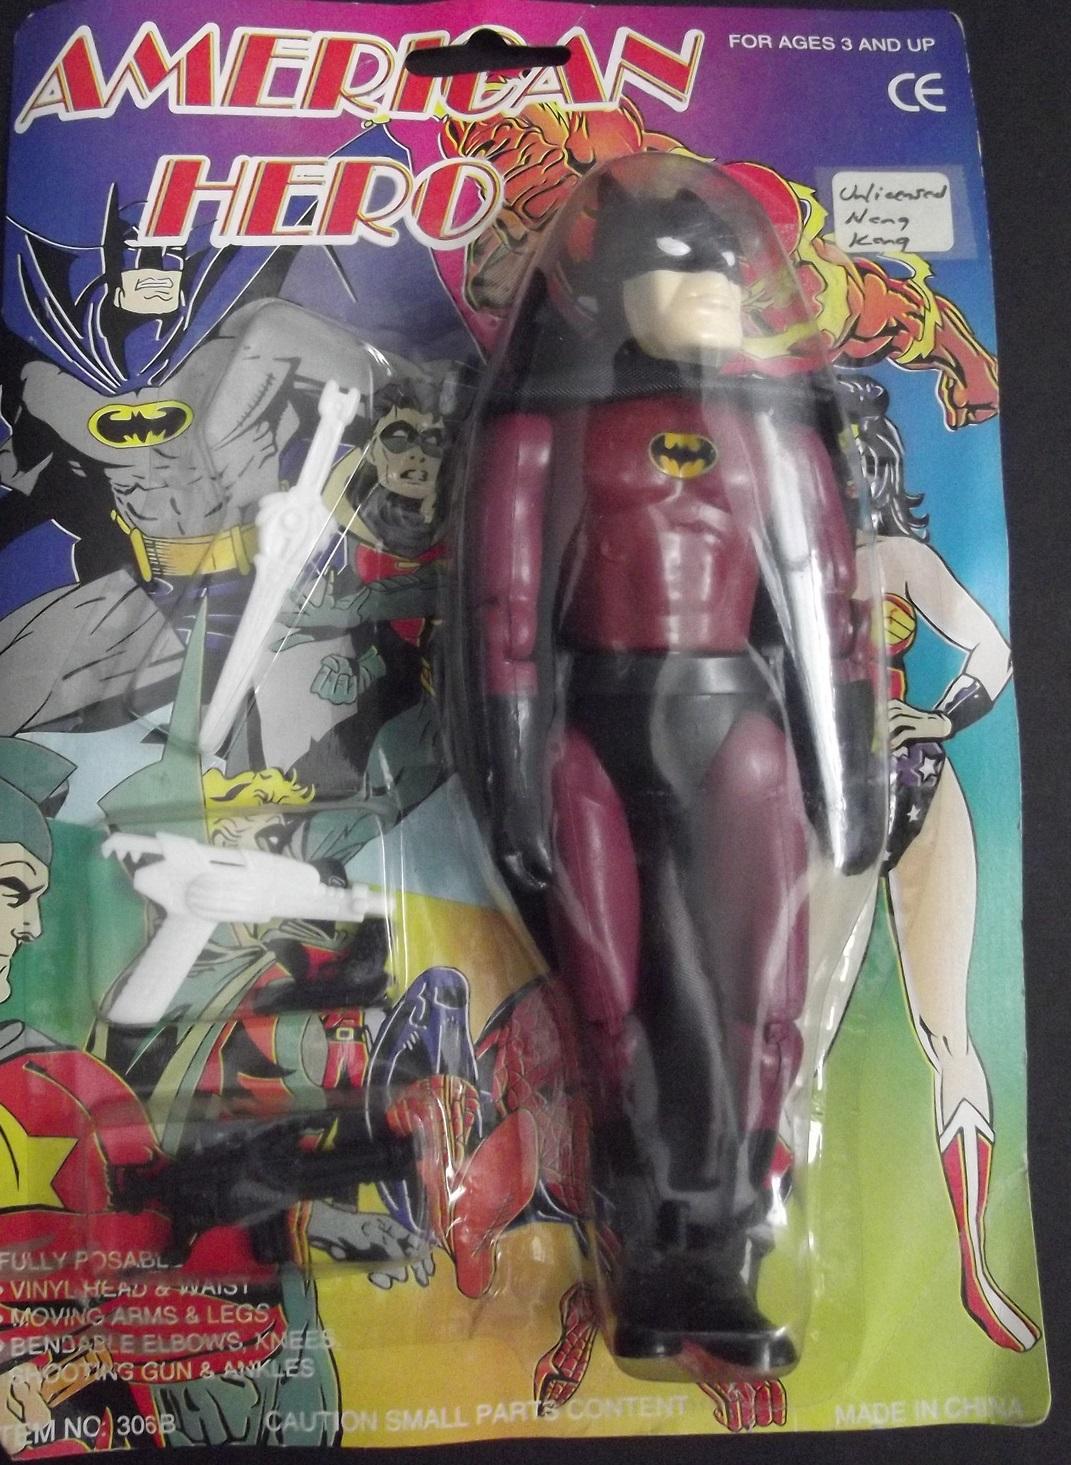 Batman (American Hero figure)